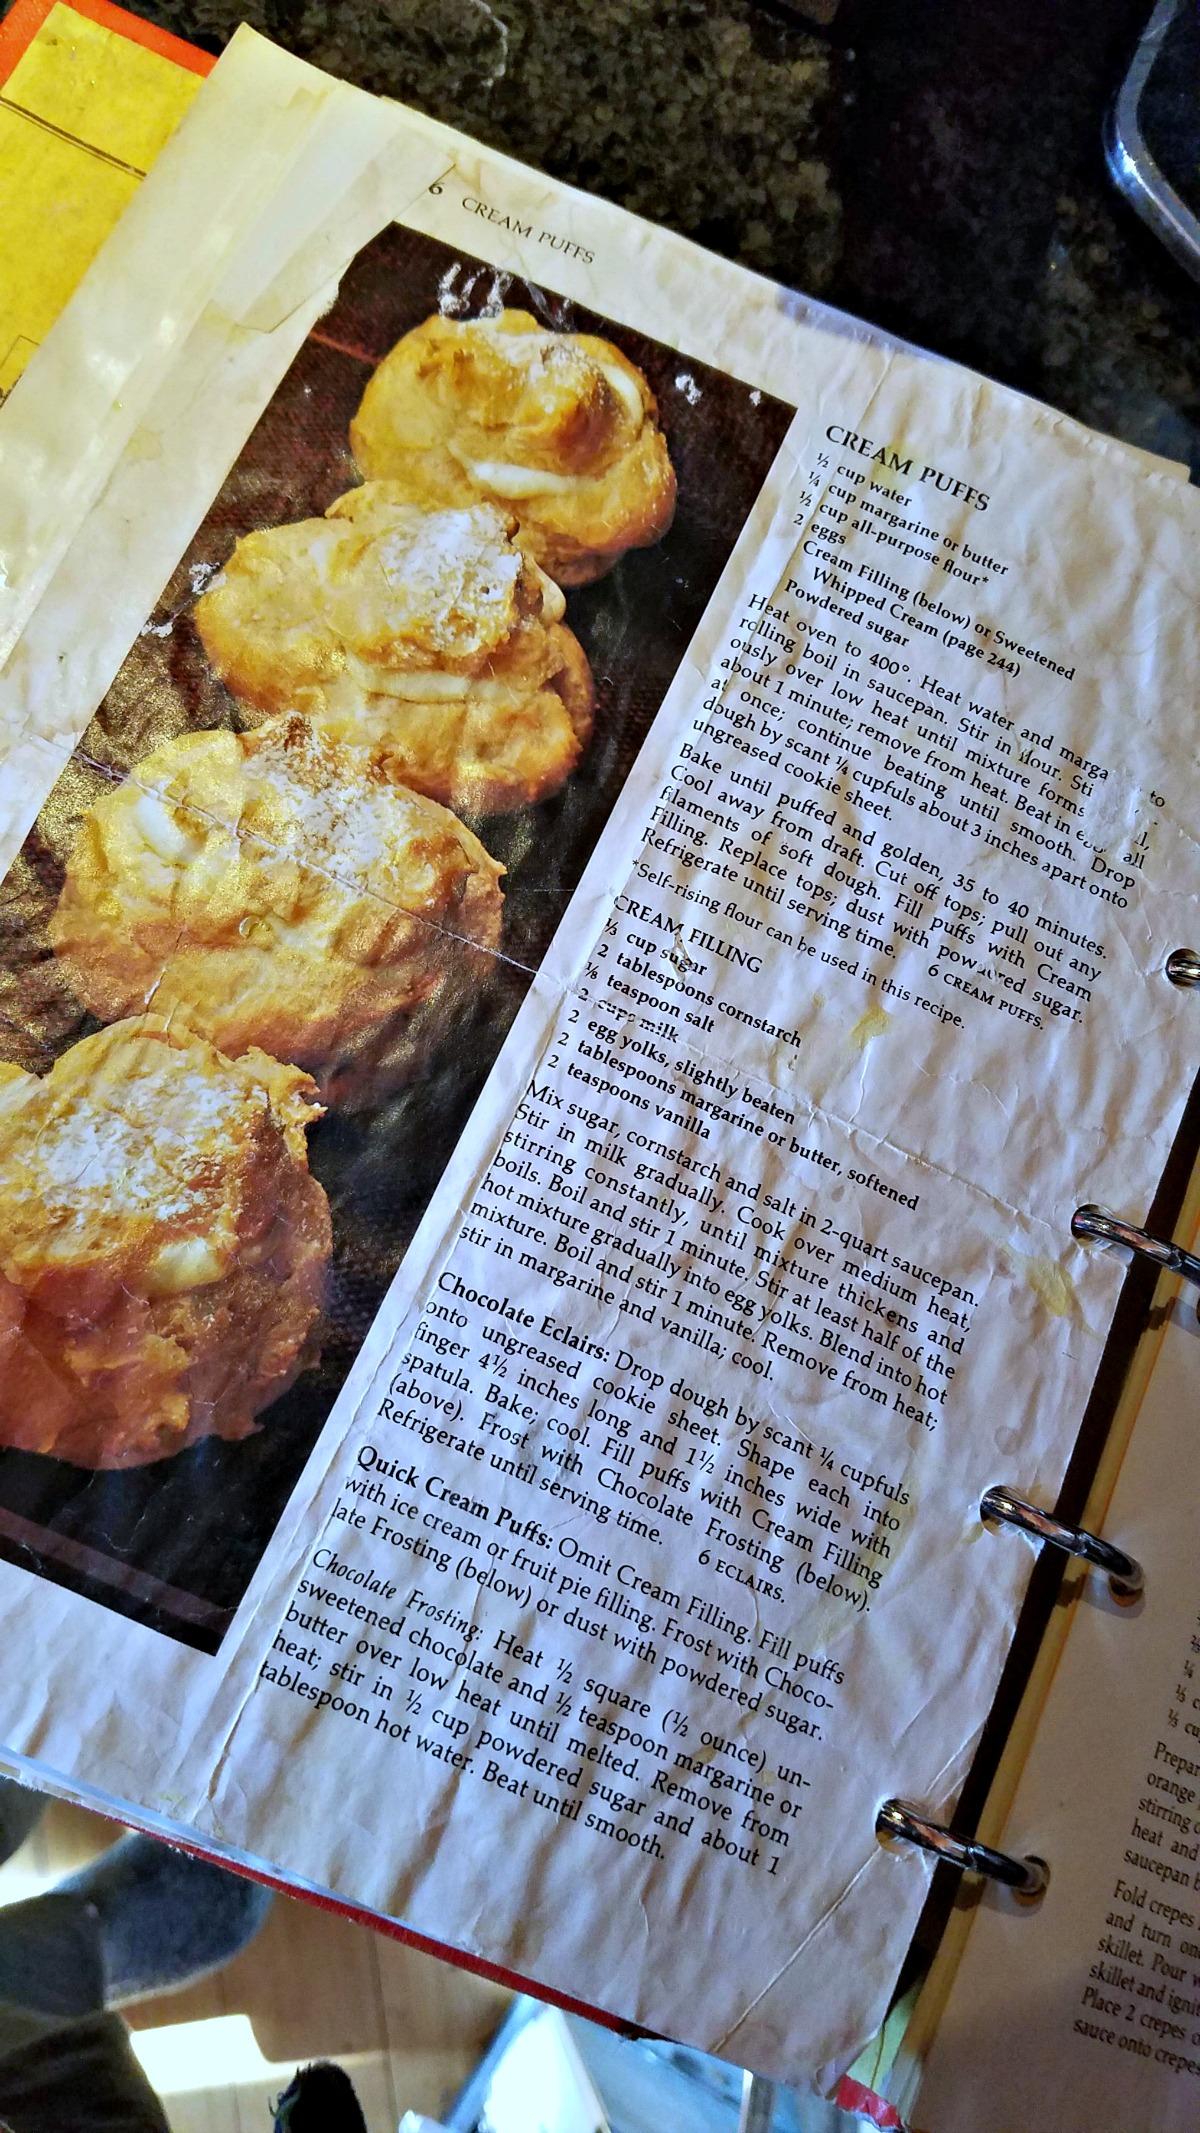 Betty Crocker Cookbook, cream puff recipe, cream puffs with spiced ice cream and salted caramel, cream puffs with ice cream, ice cream choux pastry